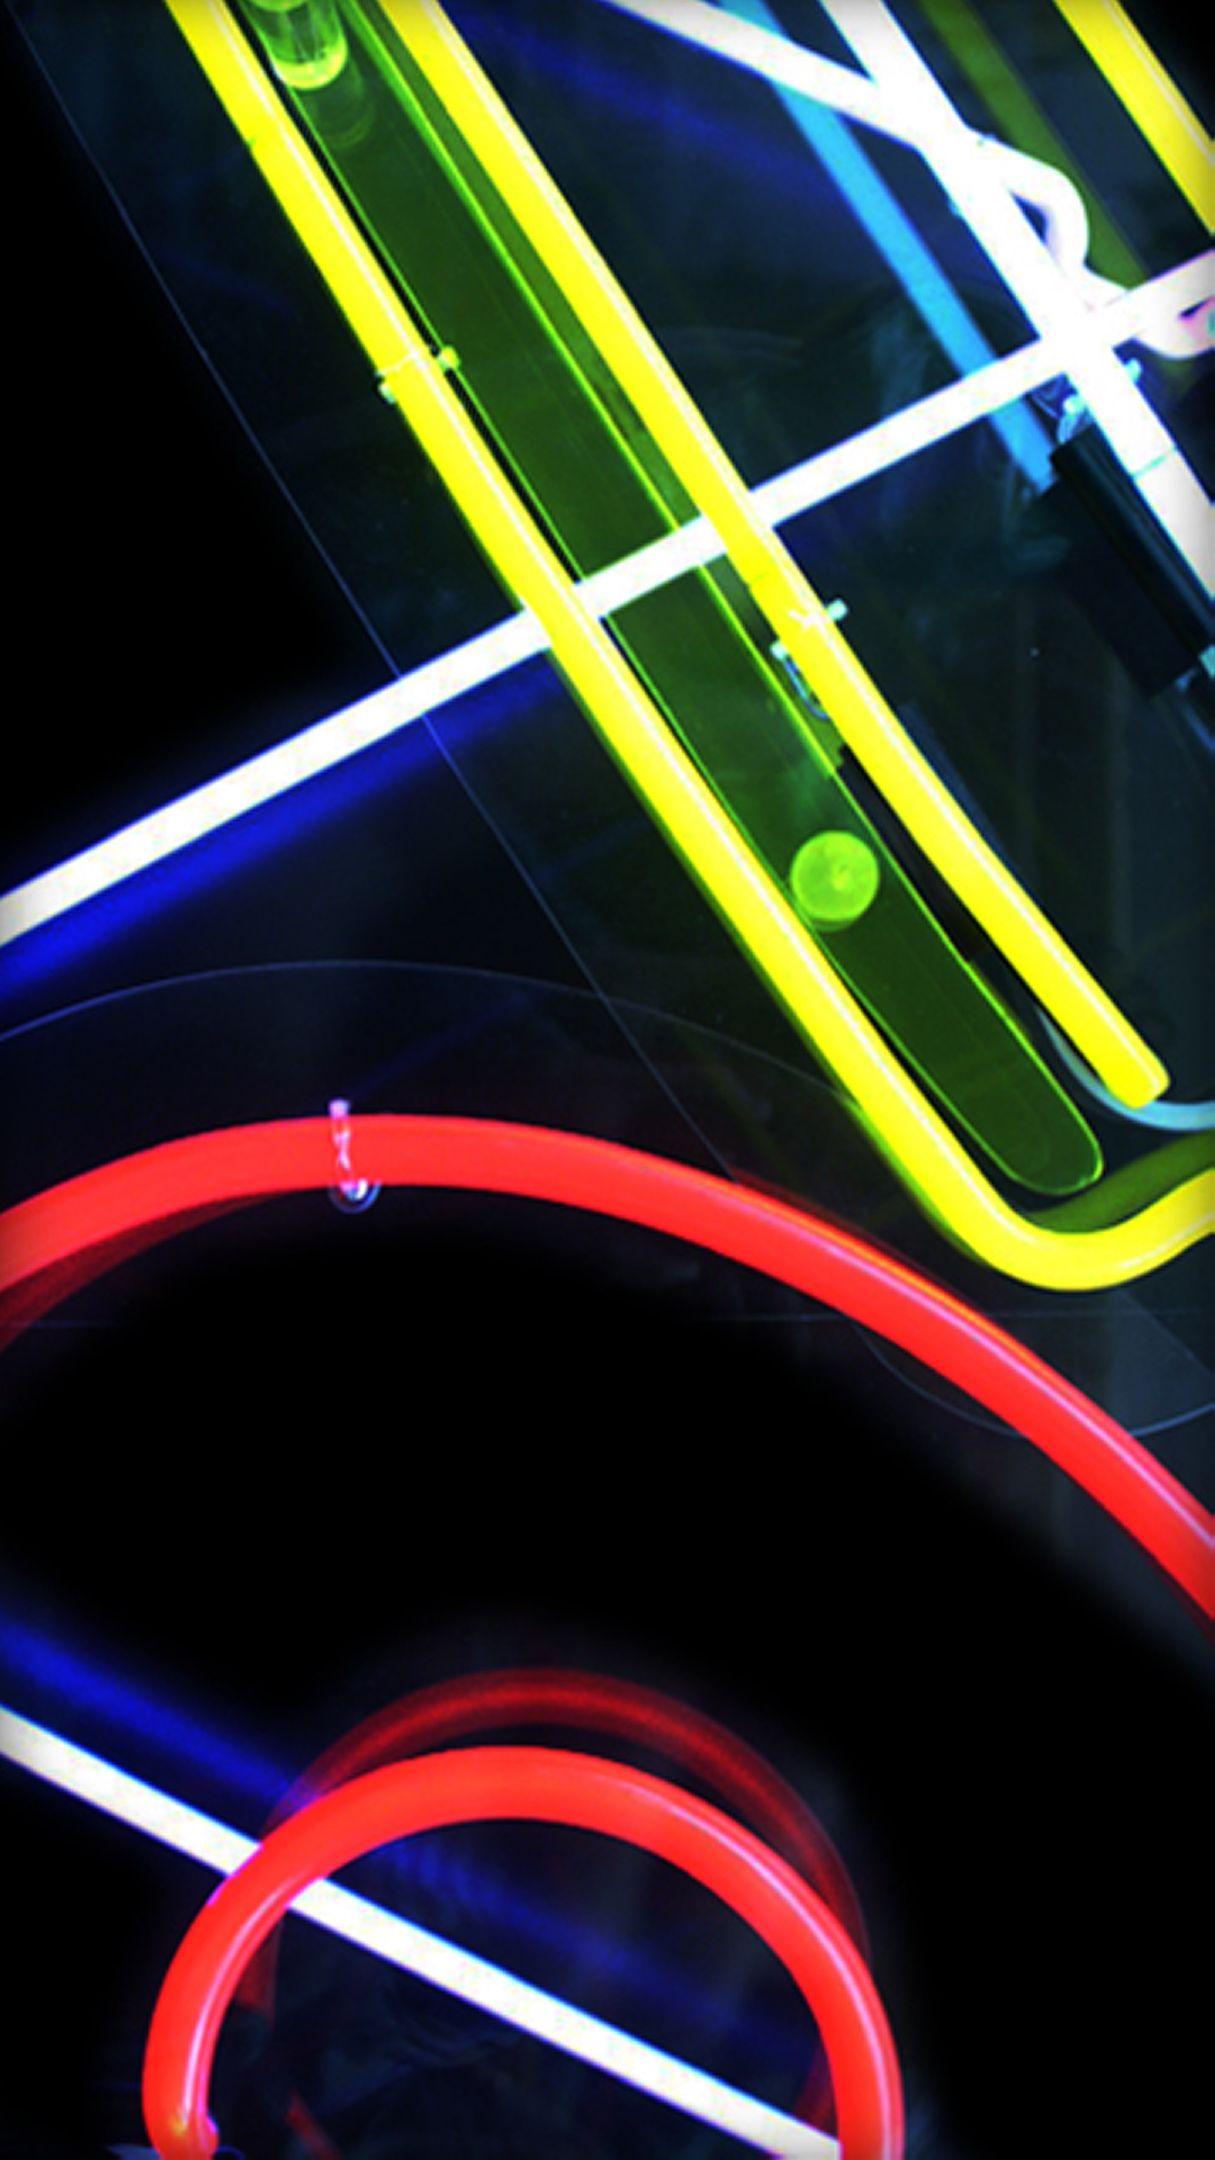 Wallpaper Iphone 8 Plus Hd خلفيات ايفون 8 الجديده Tecnologis Neon Signs Neon Neon Lighting